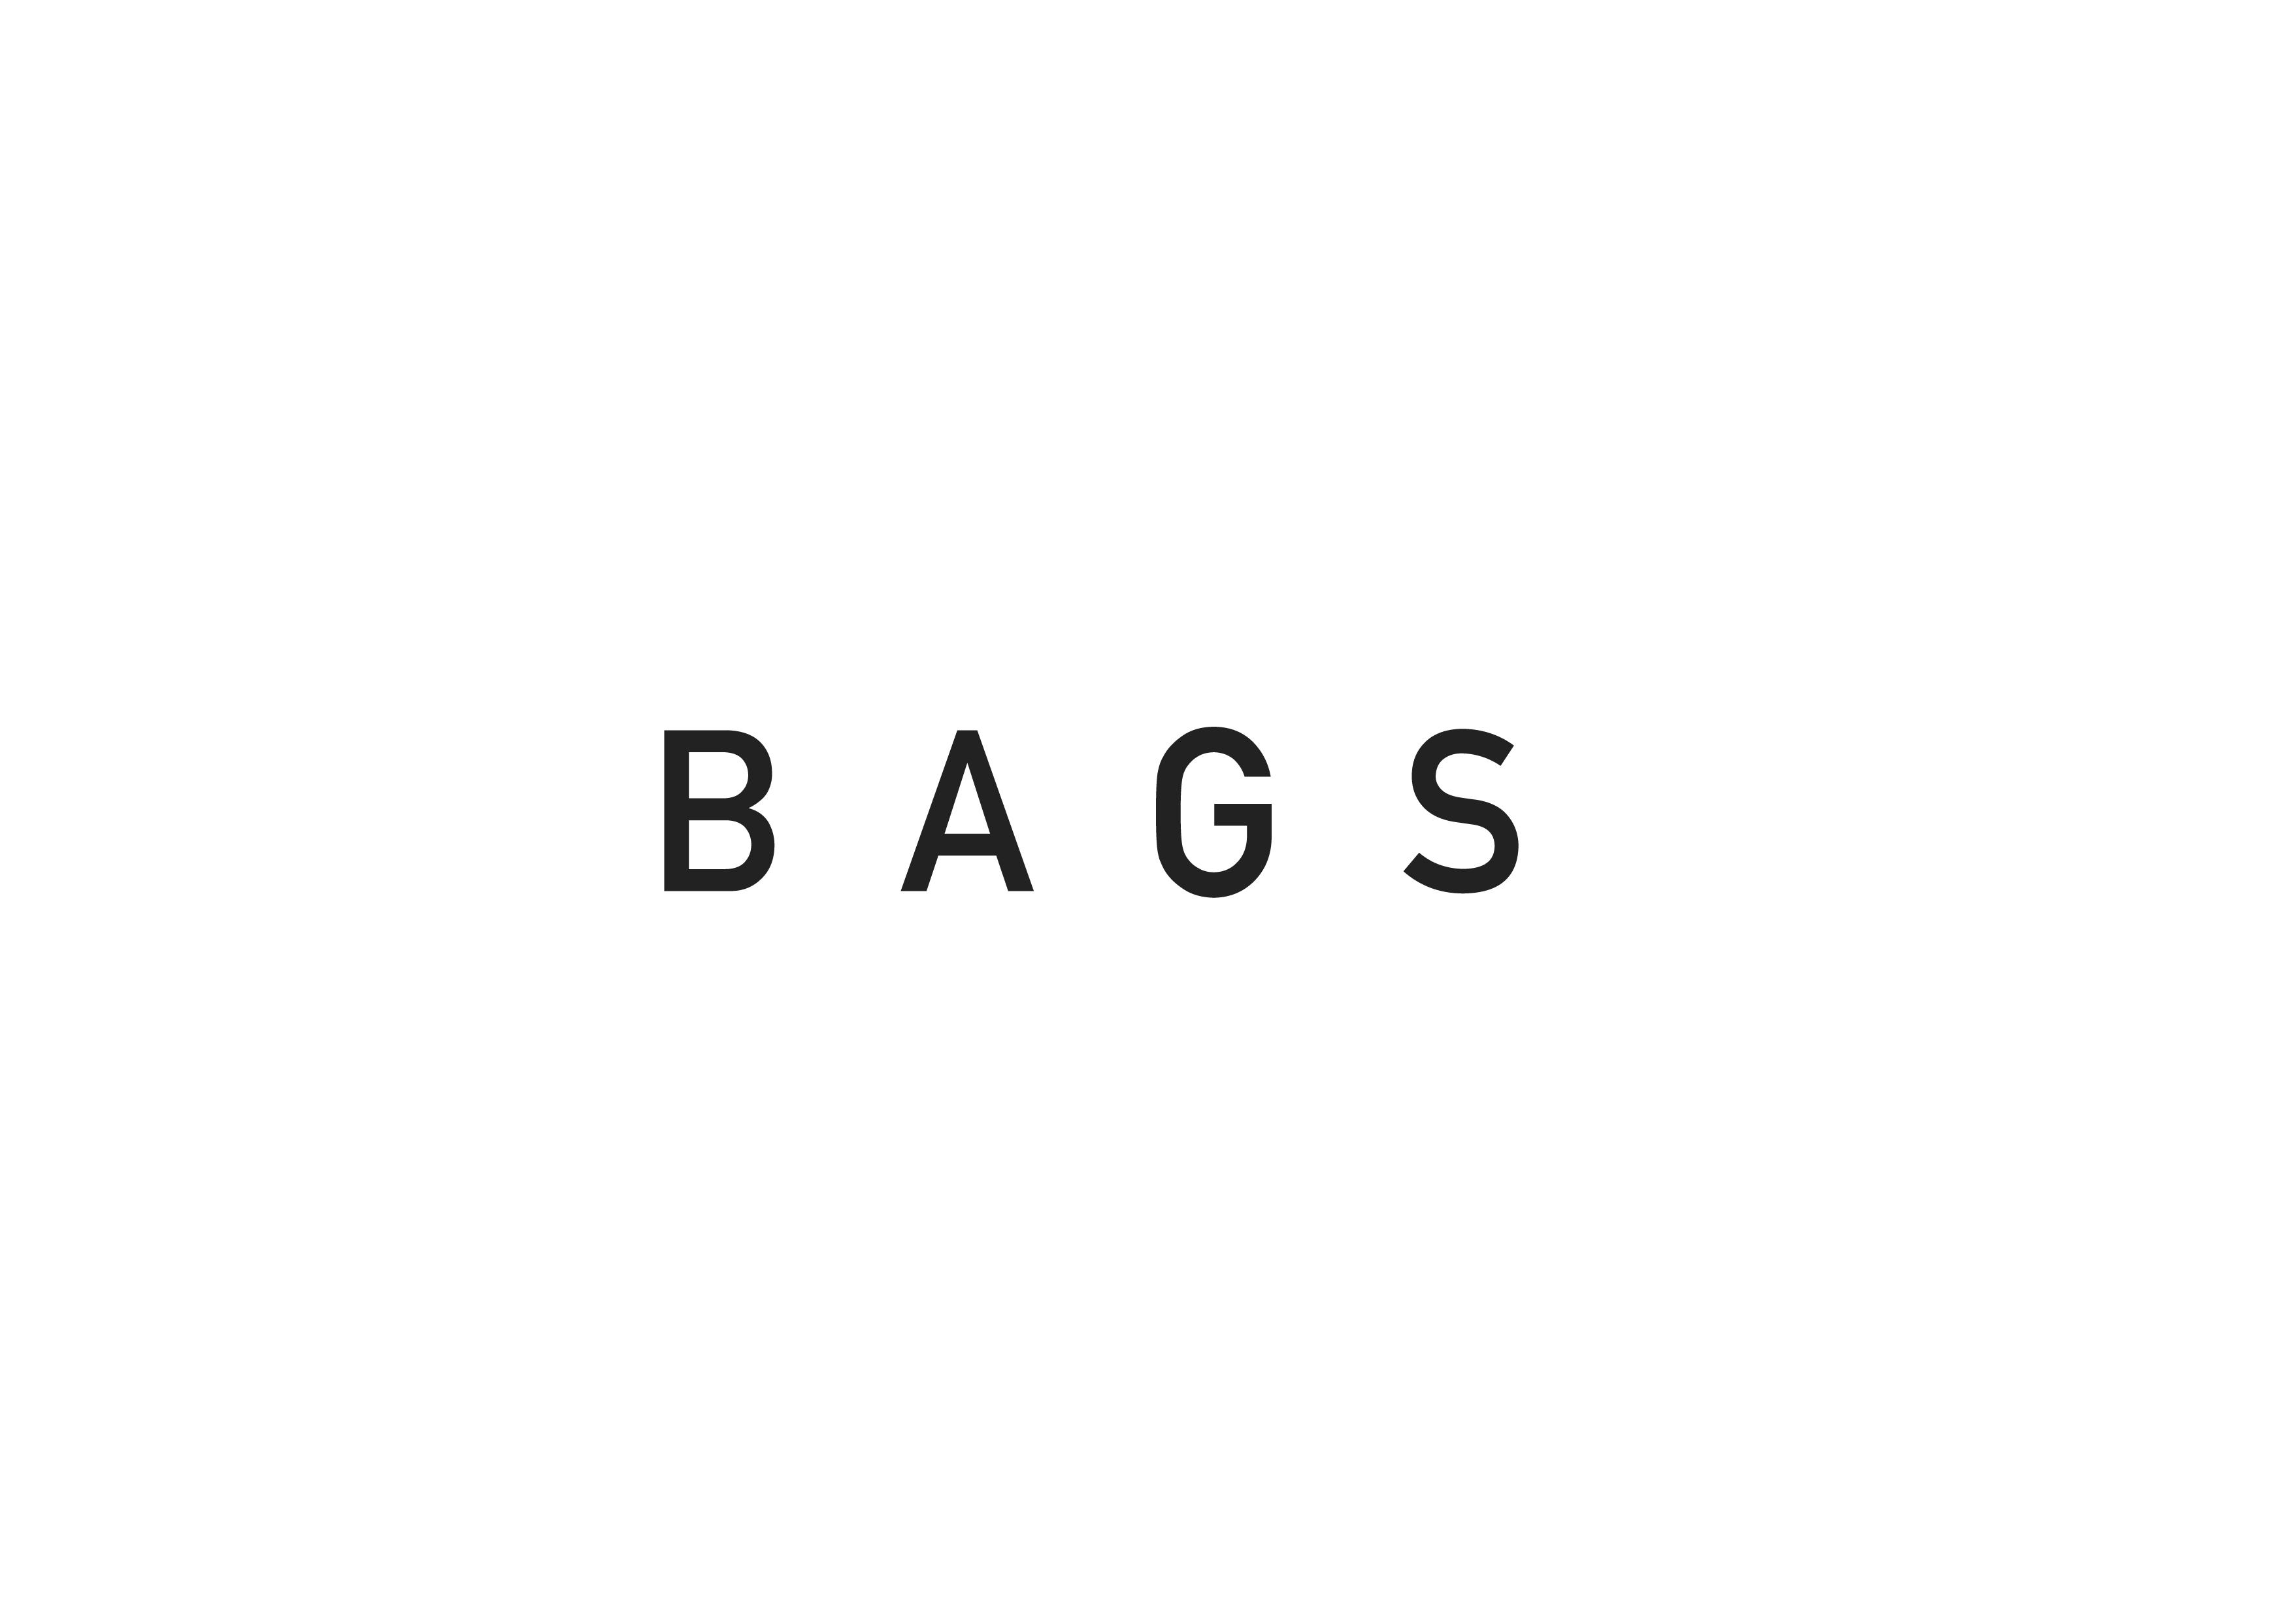 Bags-34